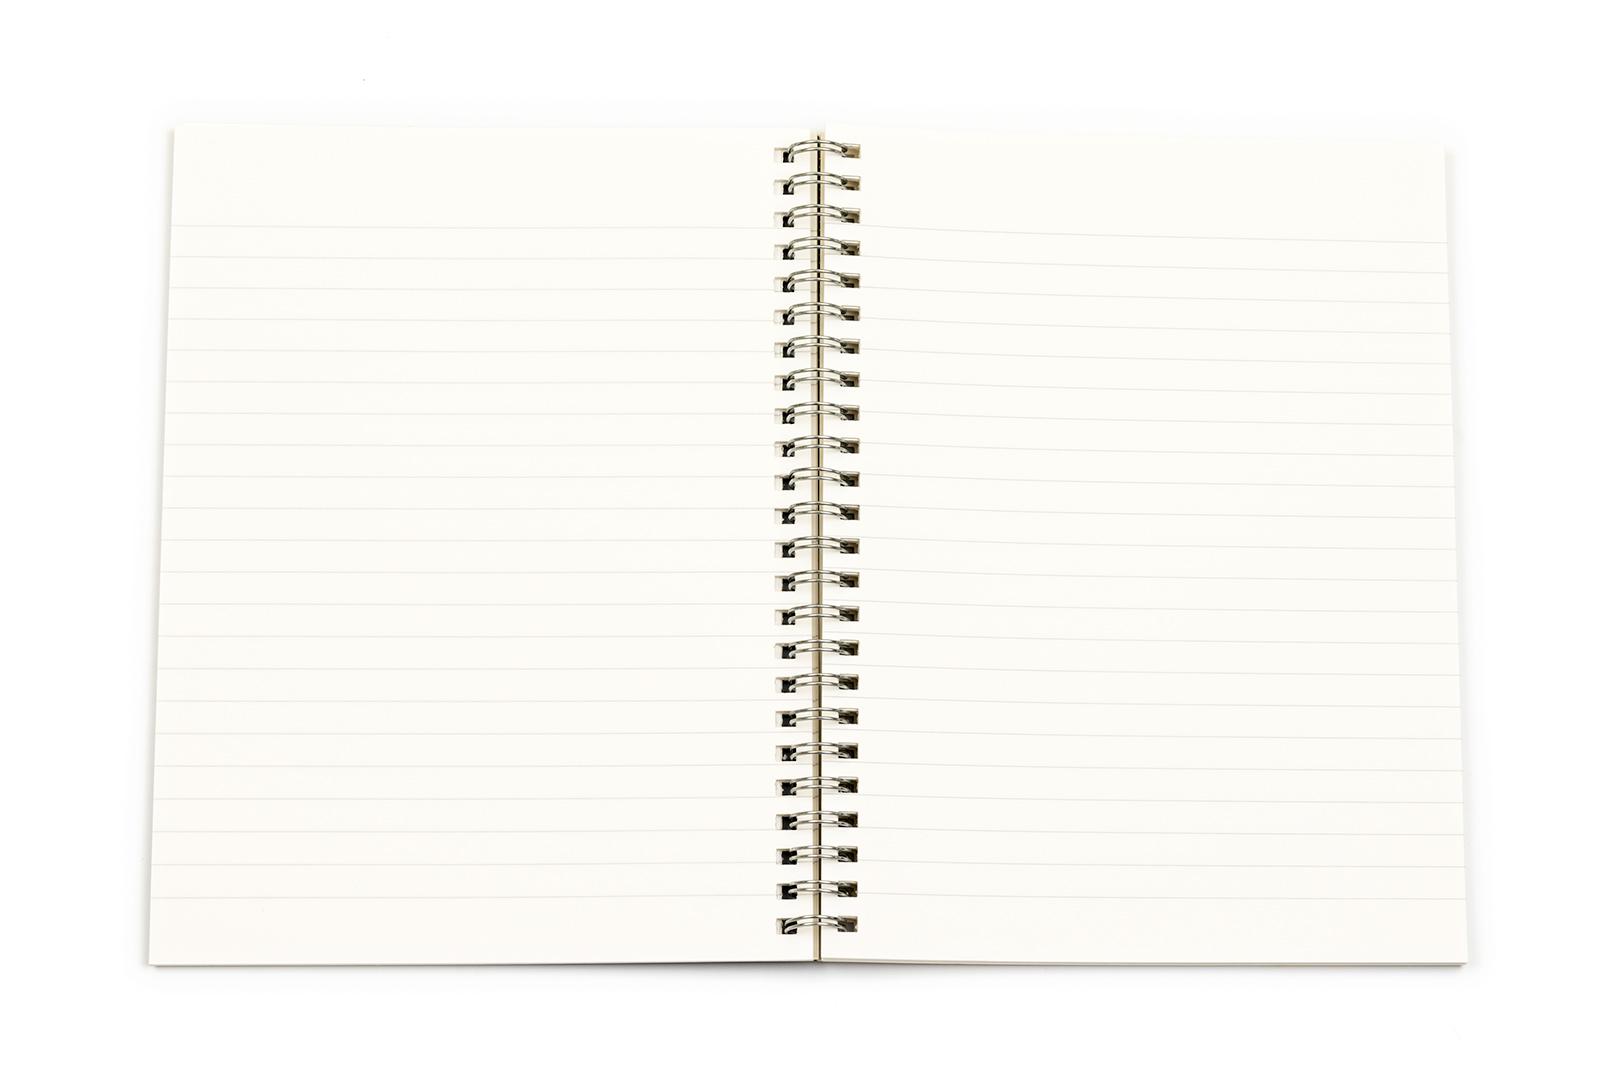 fabriano ecoqua a5 wirebound lined notebook scribe market